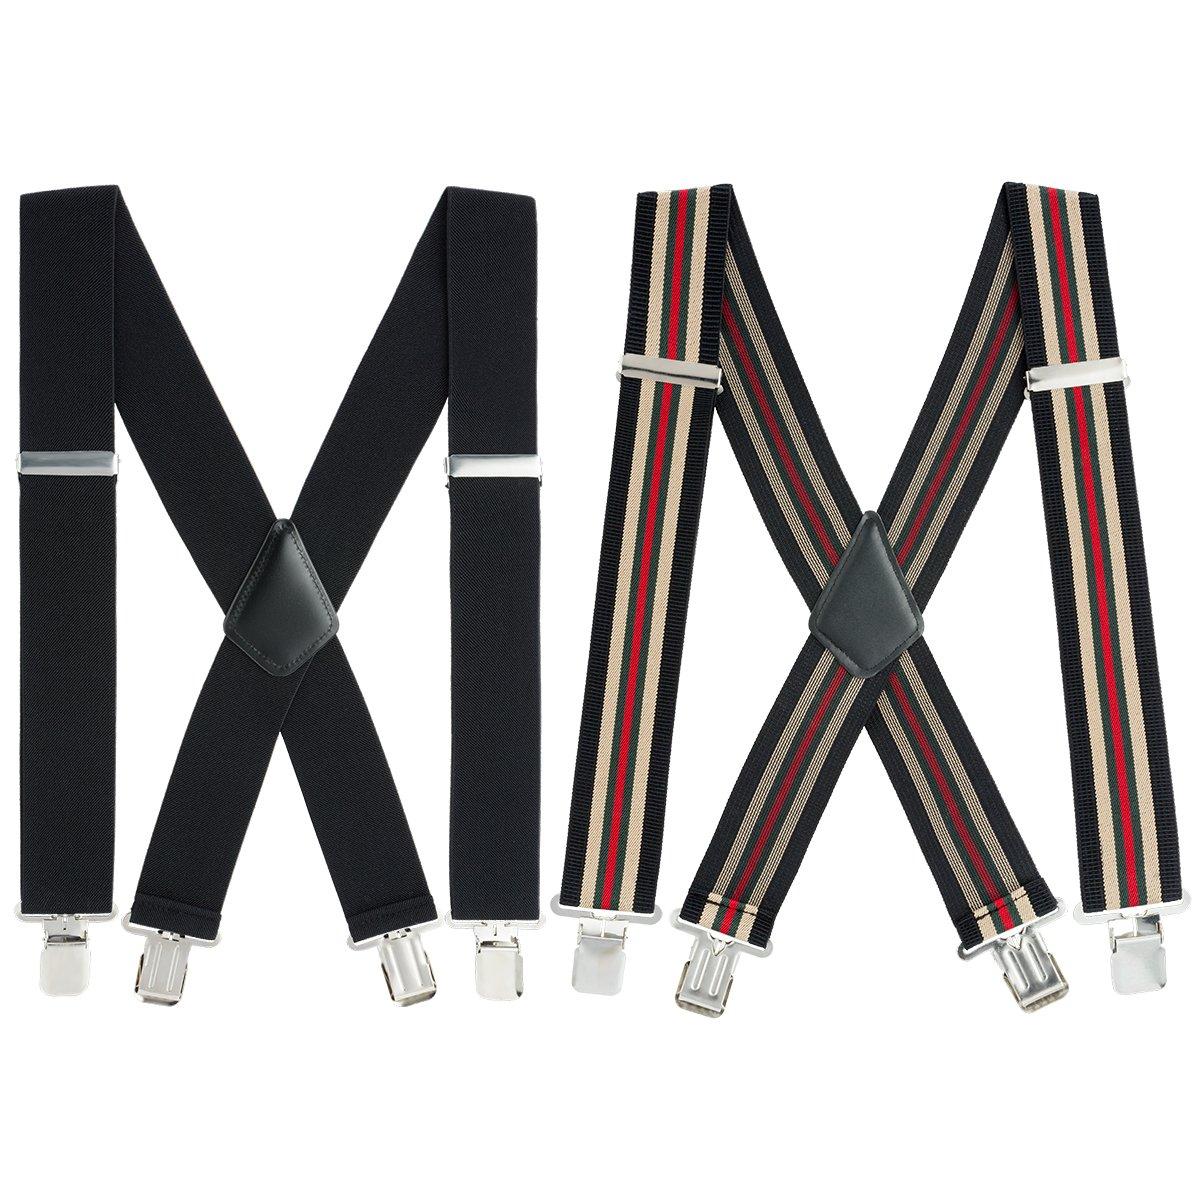 Mens X-Back Heavy Duty Work Suspenders 2'' Wide Adjustable Elastic Clip Suspenders 2pc(Black/Striped) by GradeCode (Image #1)